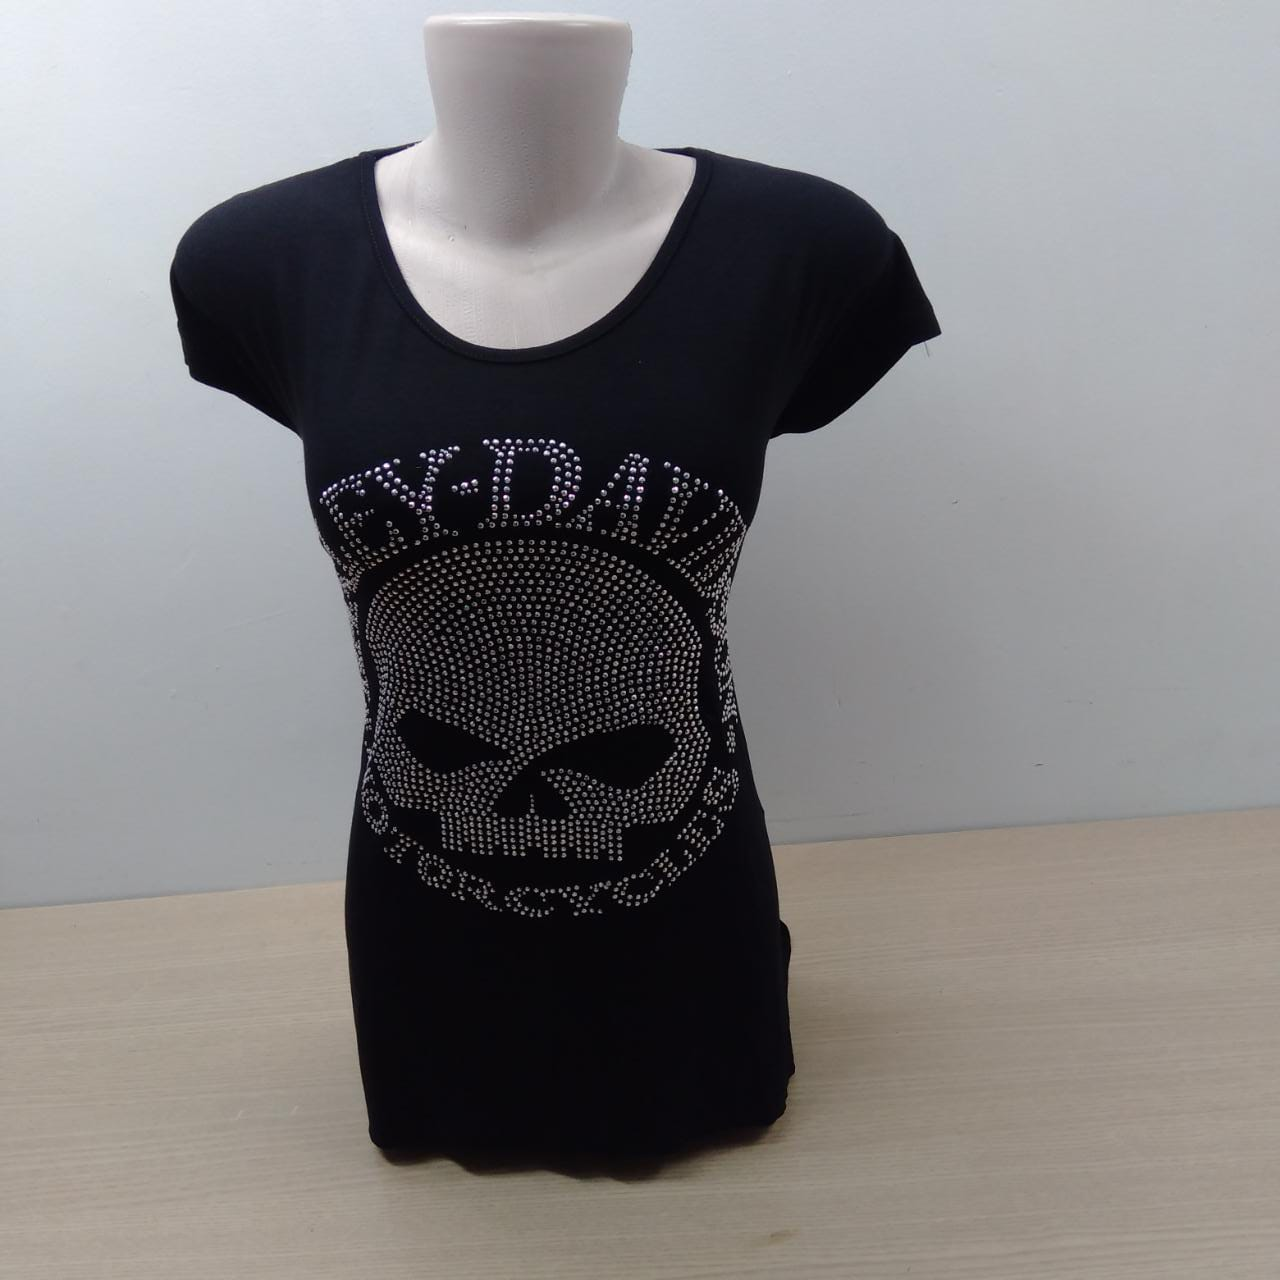 Camiseta Fem Longuete - Motivo Willie G Strass - 040/94644